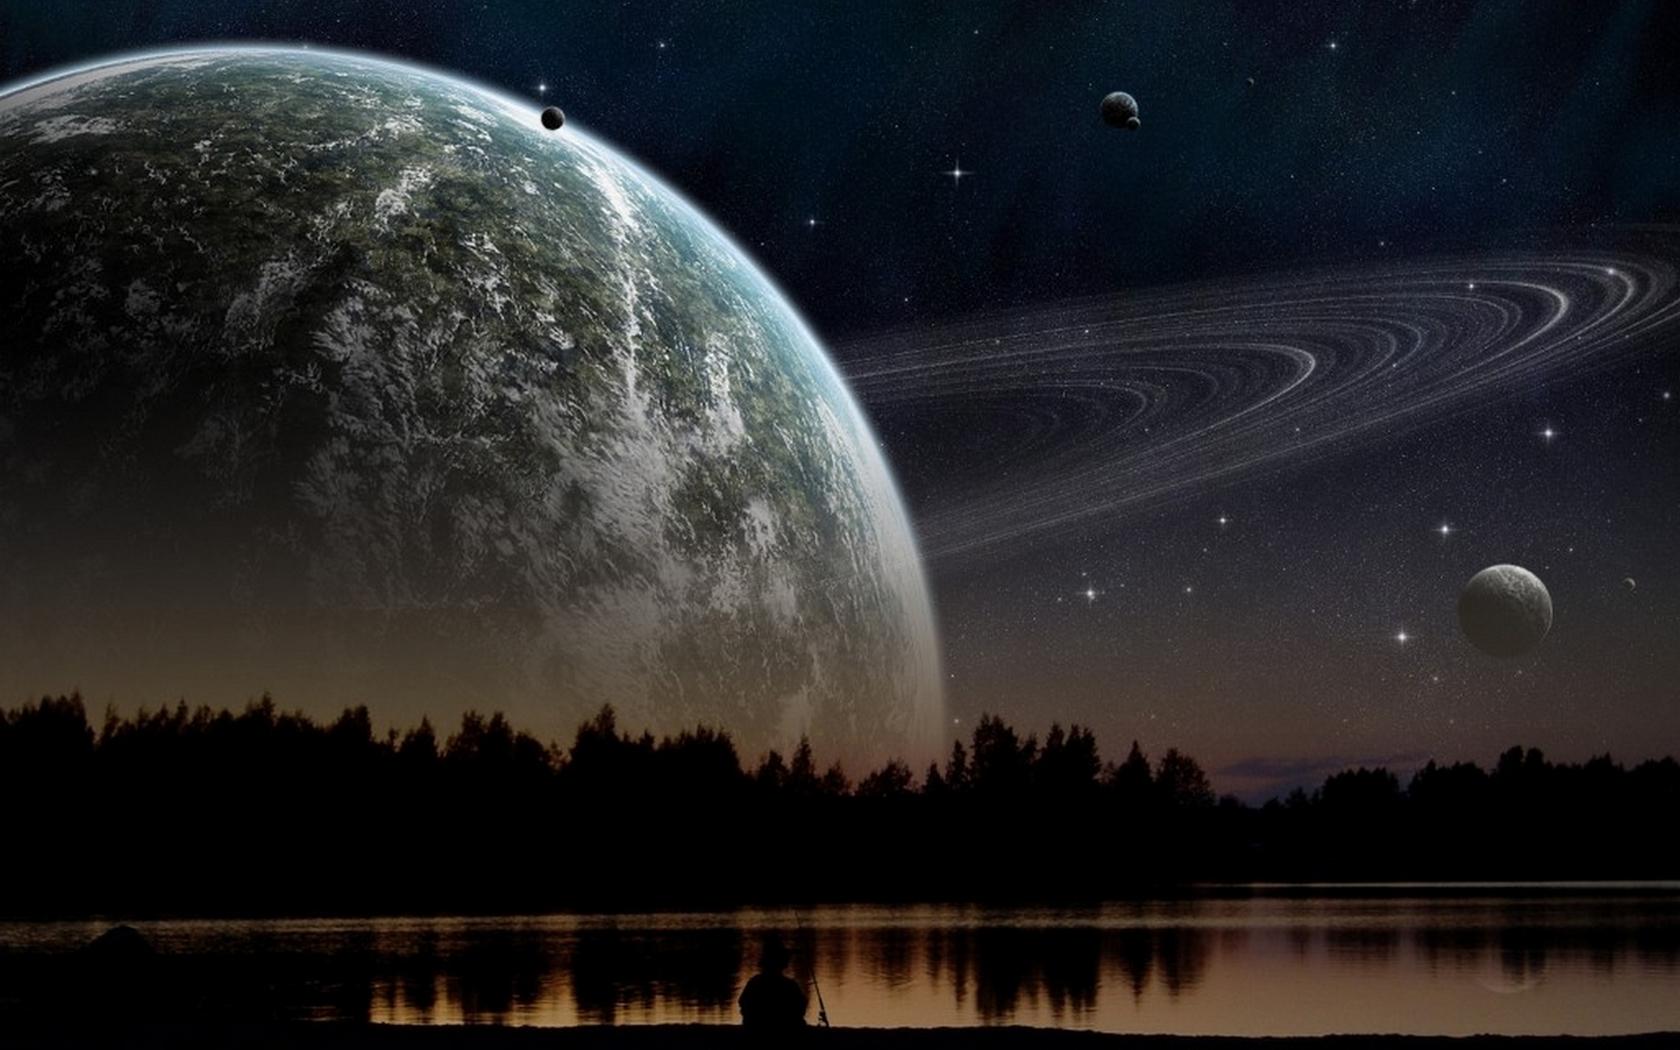 Science Fiction Wallpaper HD Widescreen Desktop Pictures Images 1680x1050